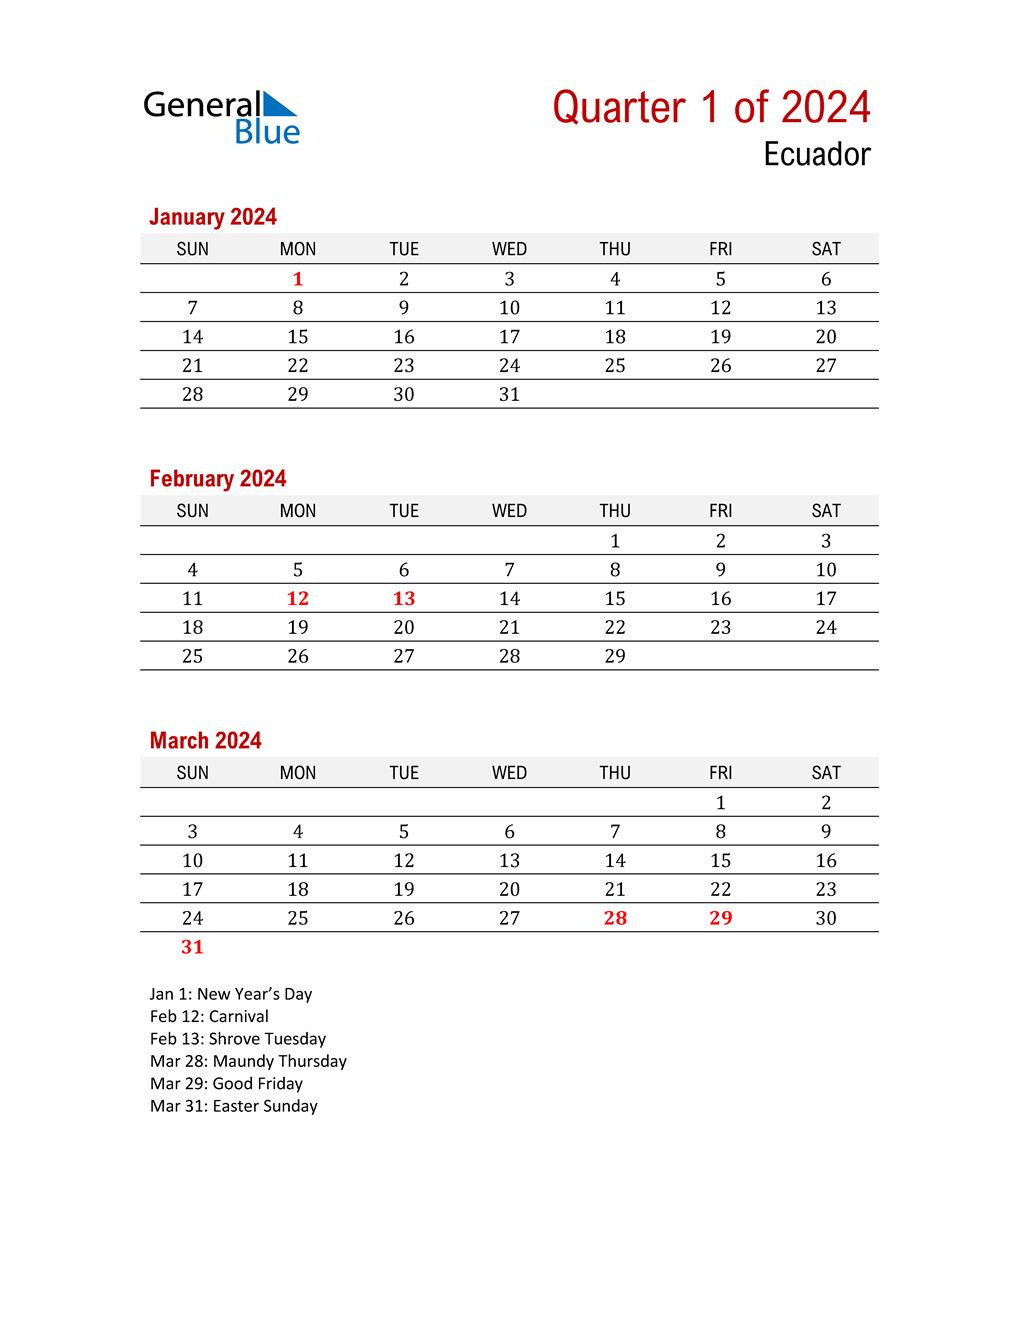 Printable Three Month Calendar for Ecuador